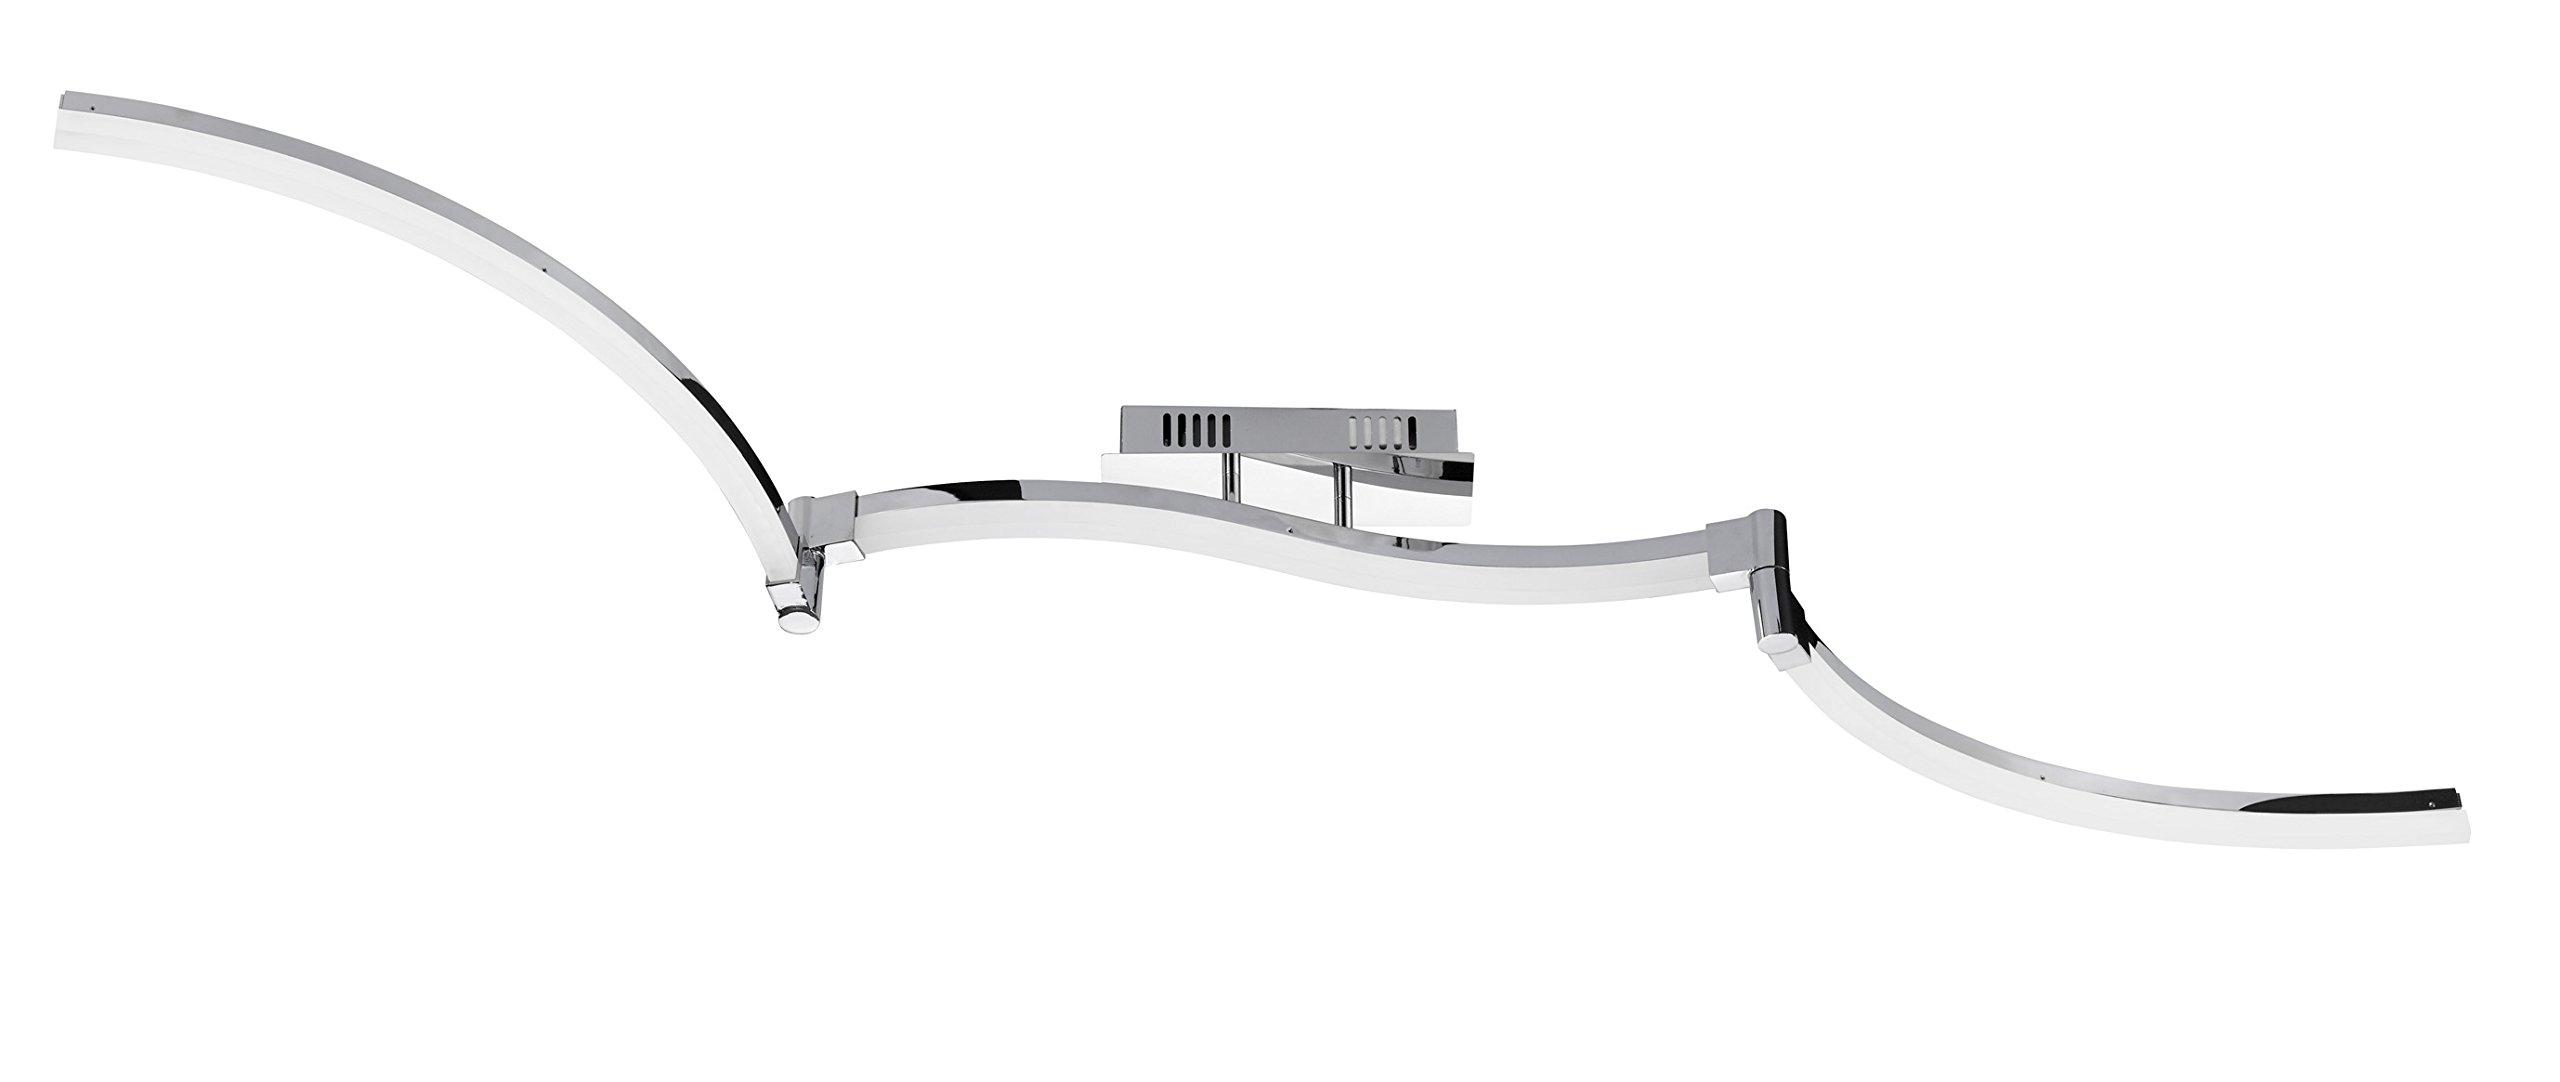 WOFI LED Ceiling Light 8W Built-in Metal 80x 135x 1540cm, Chrome 904703015000